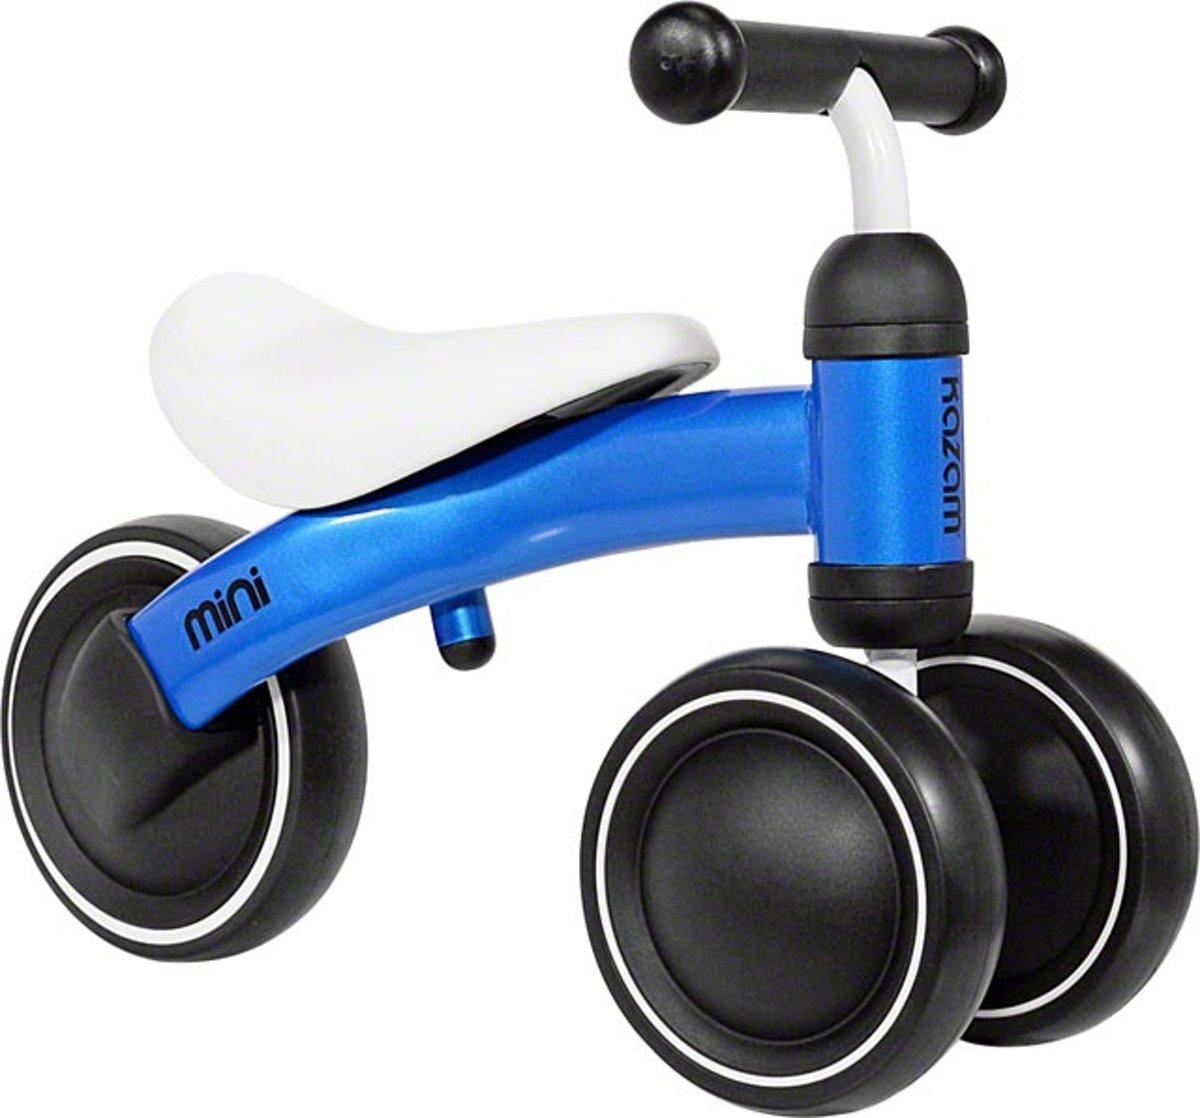 Weeride Kazam Mini - Loopfiets - Jongens en meisjes - Blauw